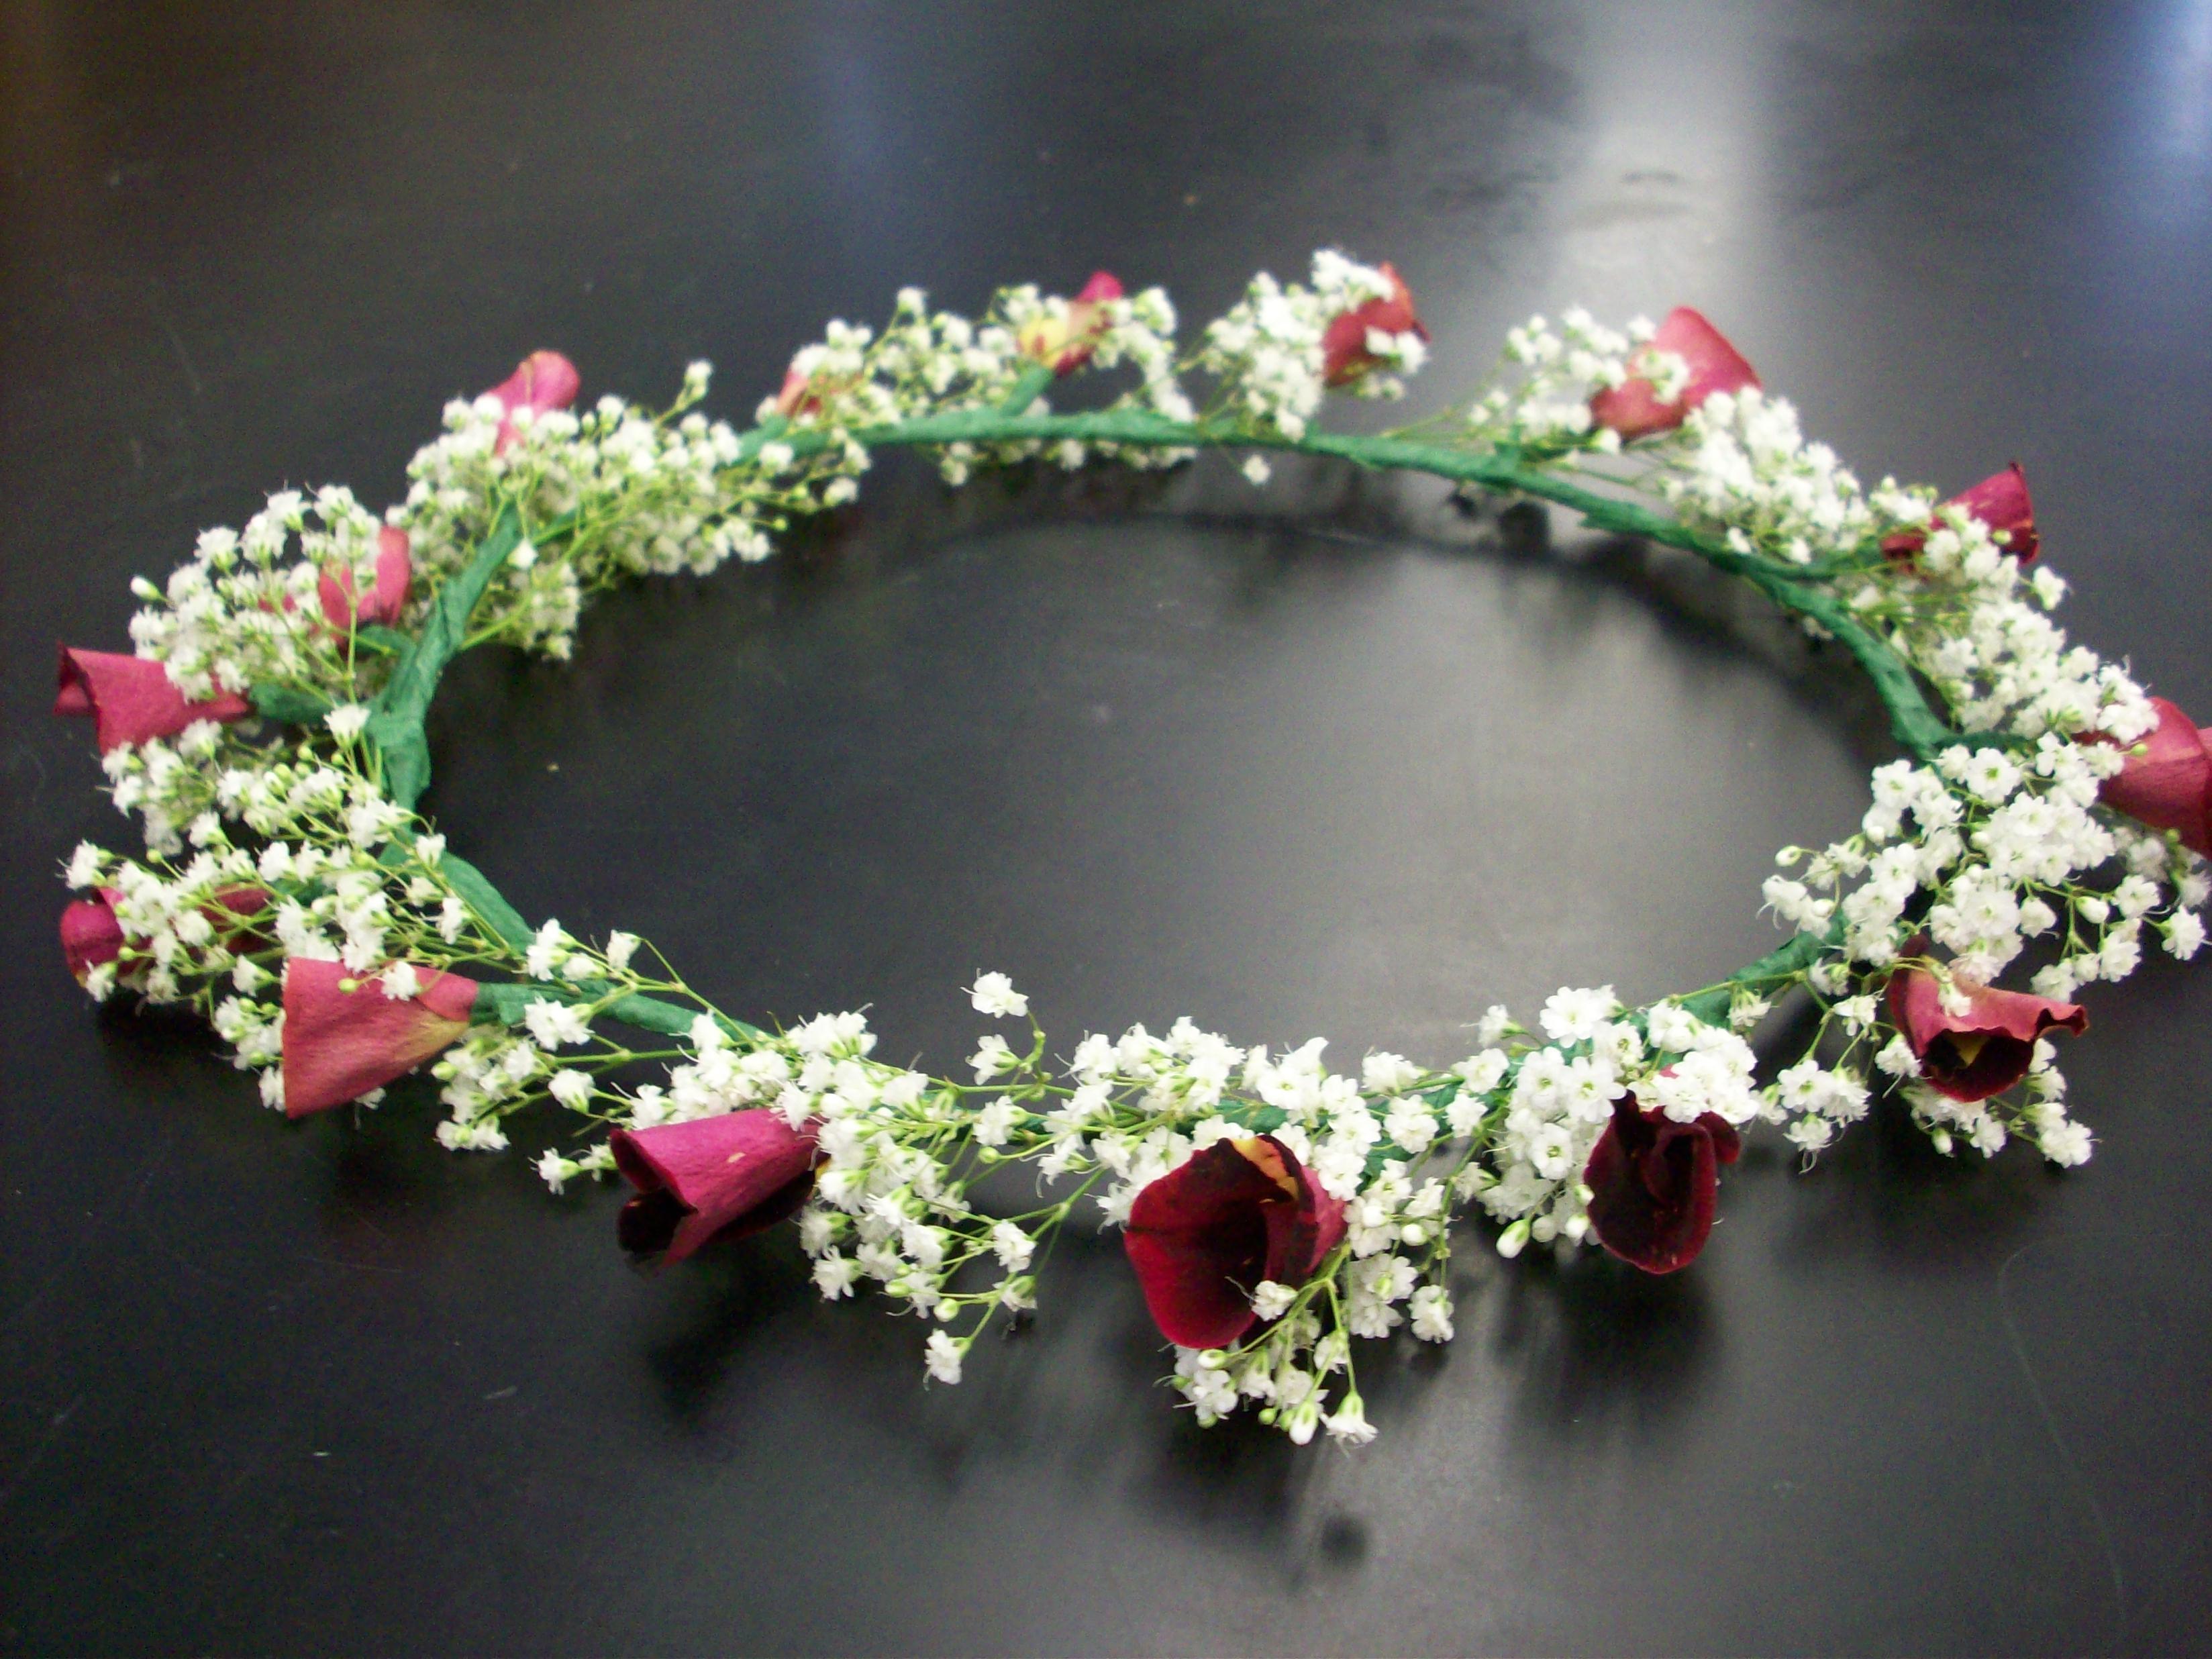 Trisori: Love Of The Week: Laurels